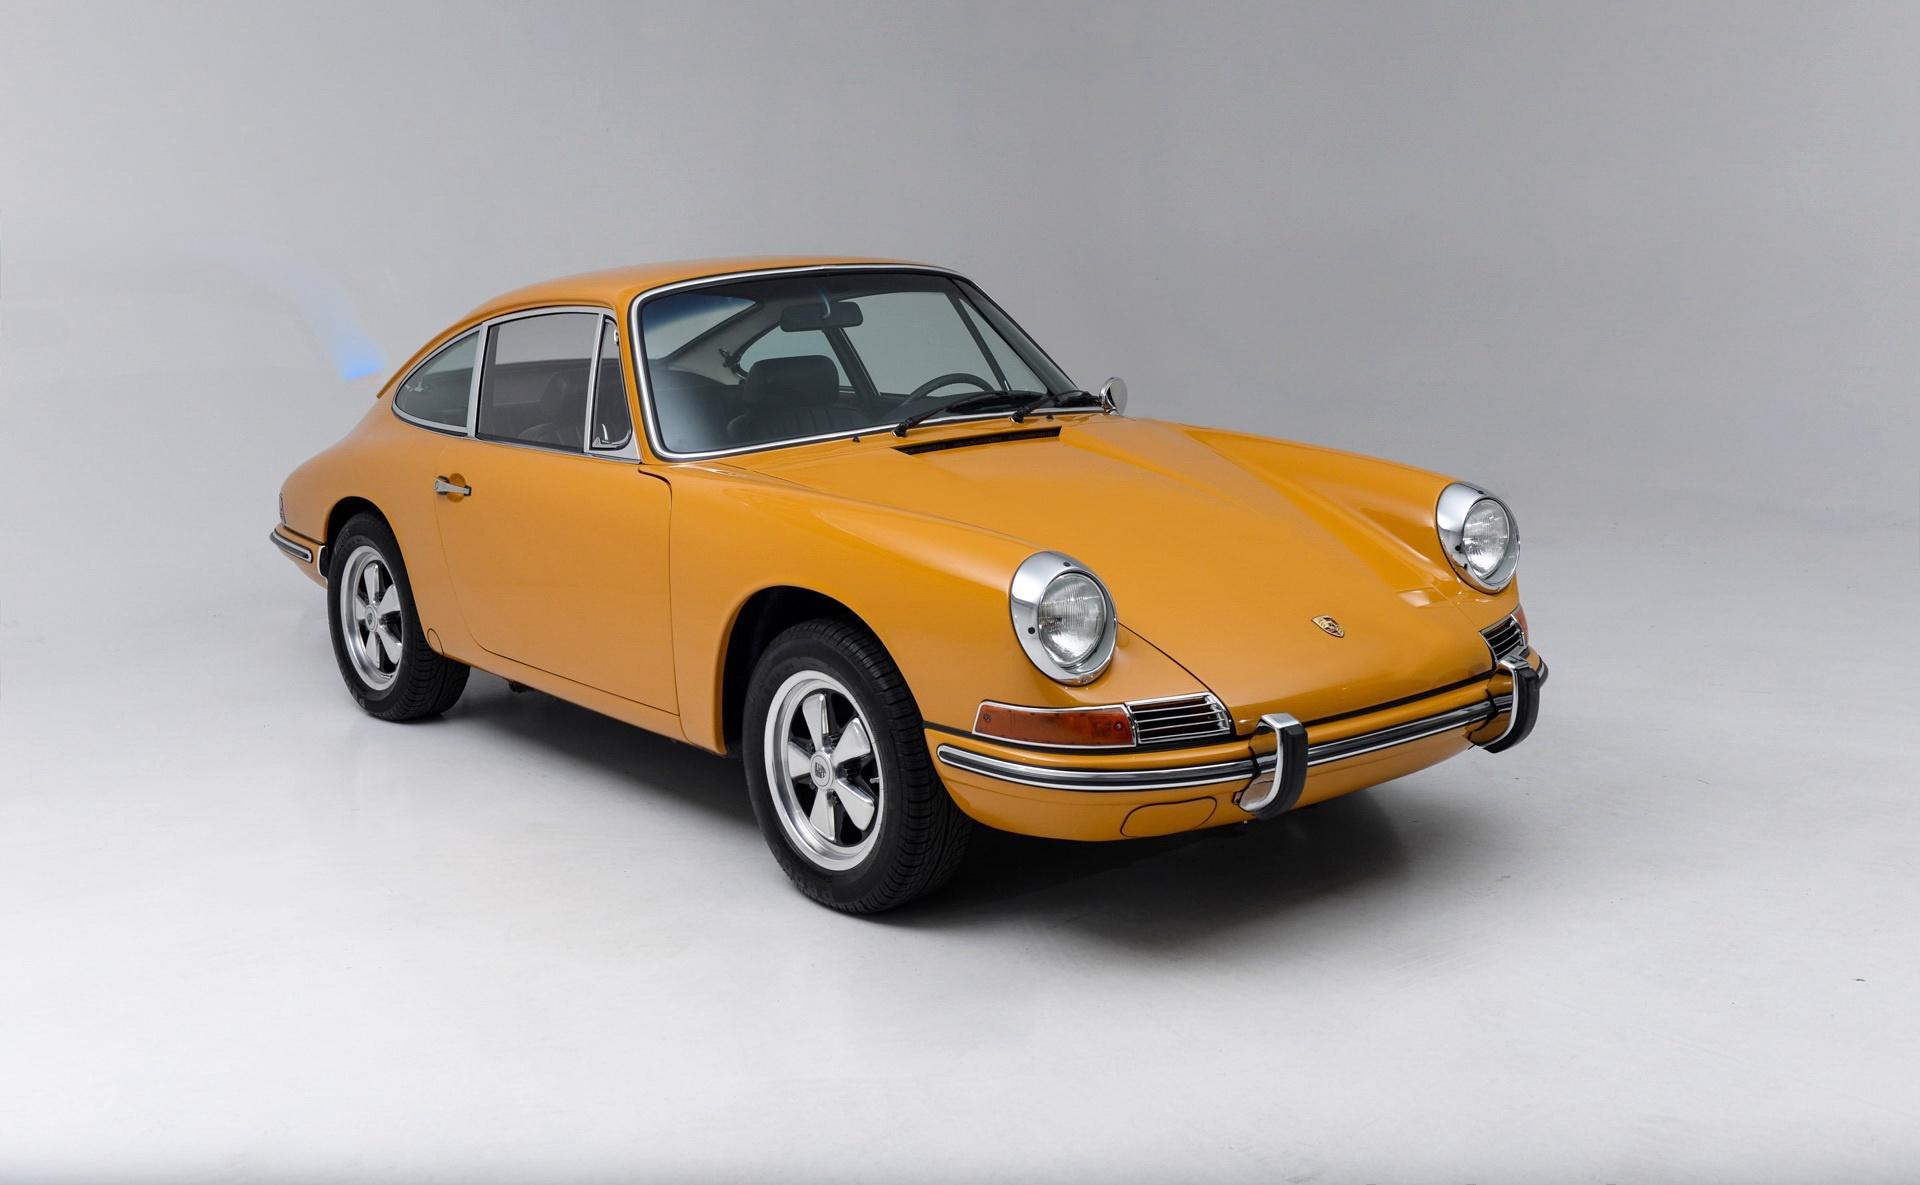 1968 porsche 911 exotic classic car dealership new york l champion motors international. Black Bedroom Furniture Sets. Home Design Ideas